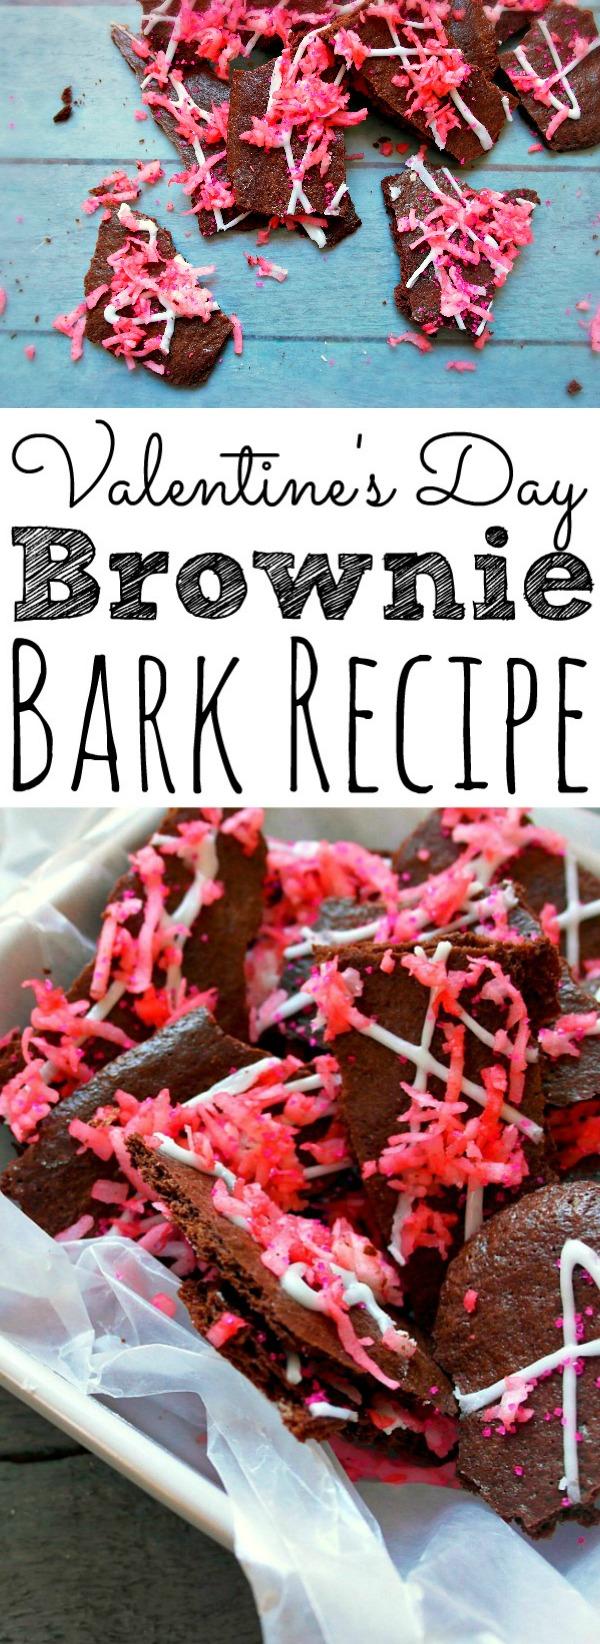 Valentine's Day Brownie Bark